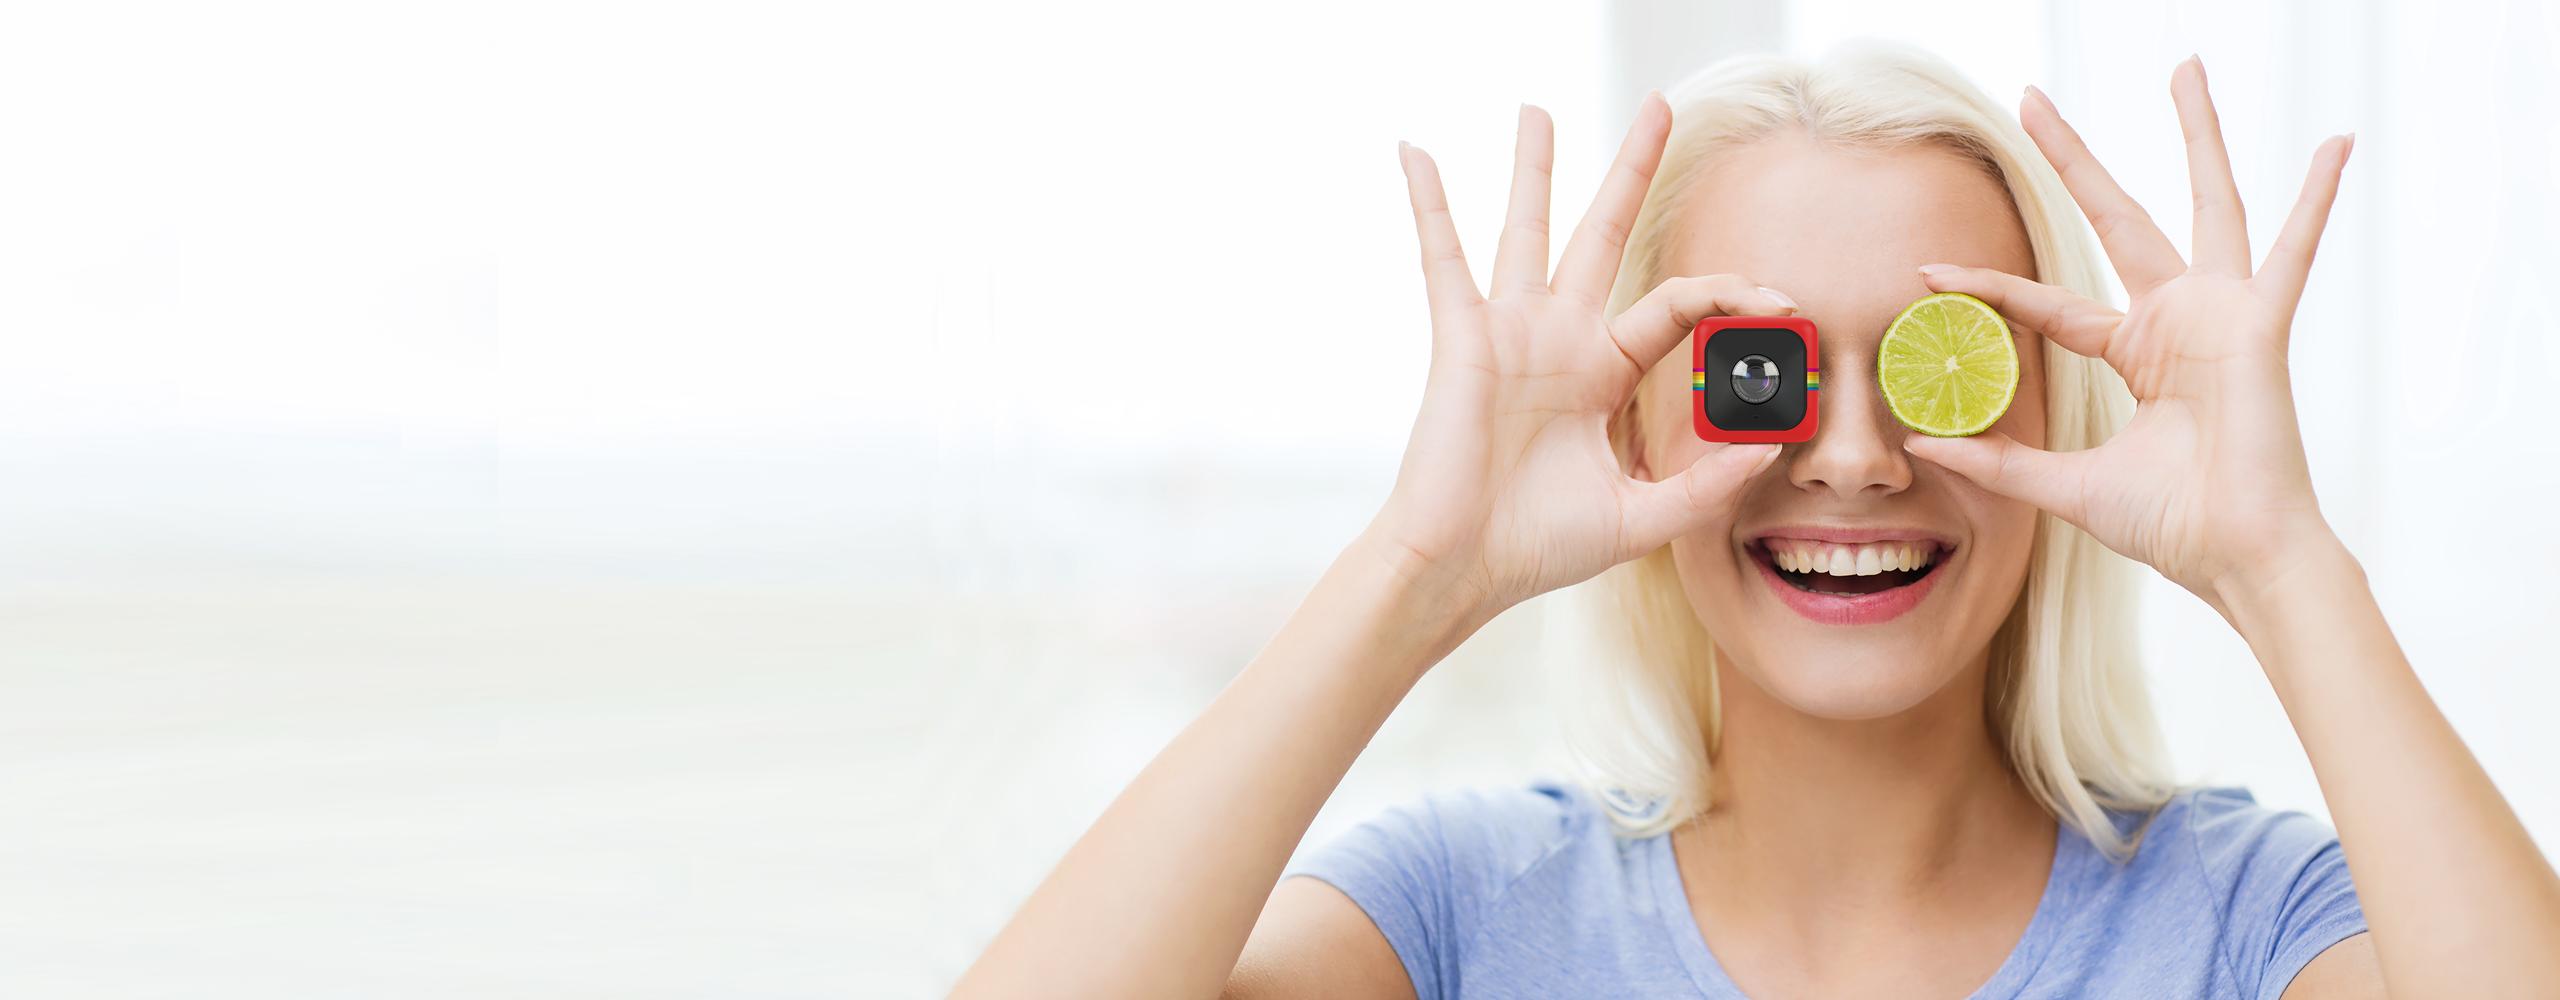 Polaroid: Making a massive impact at CES2017